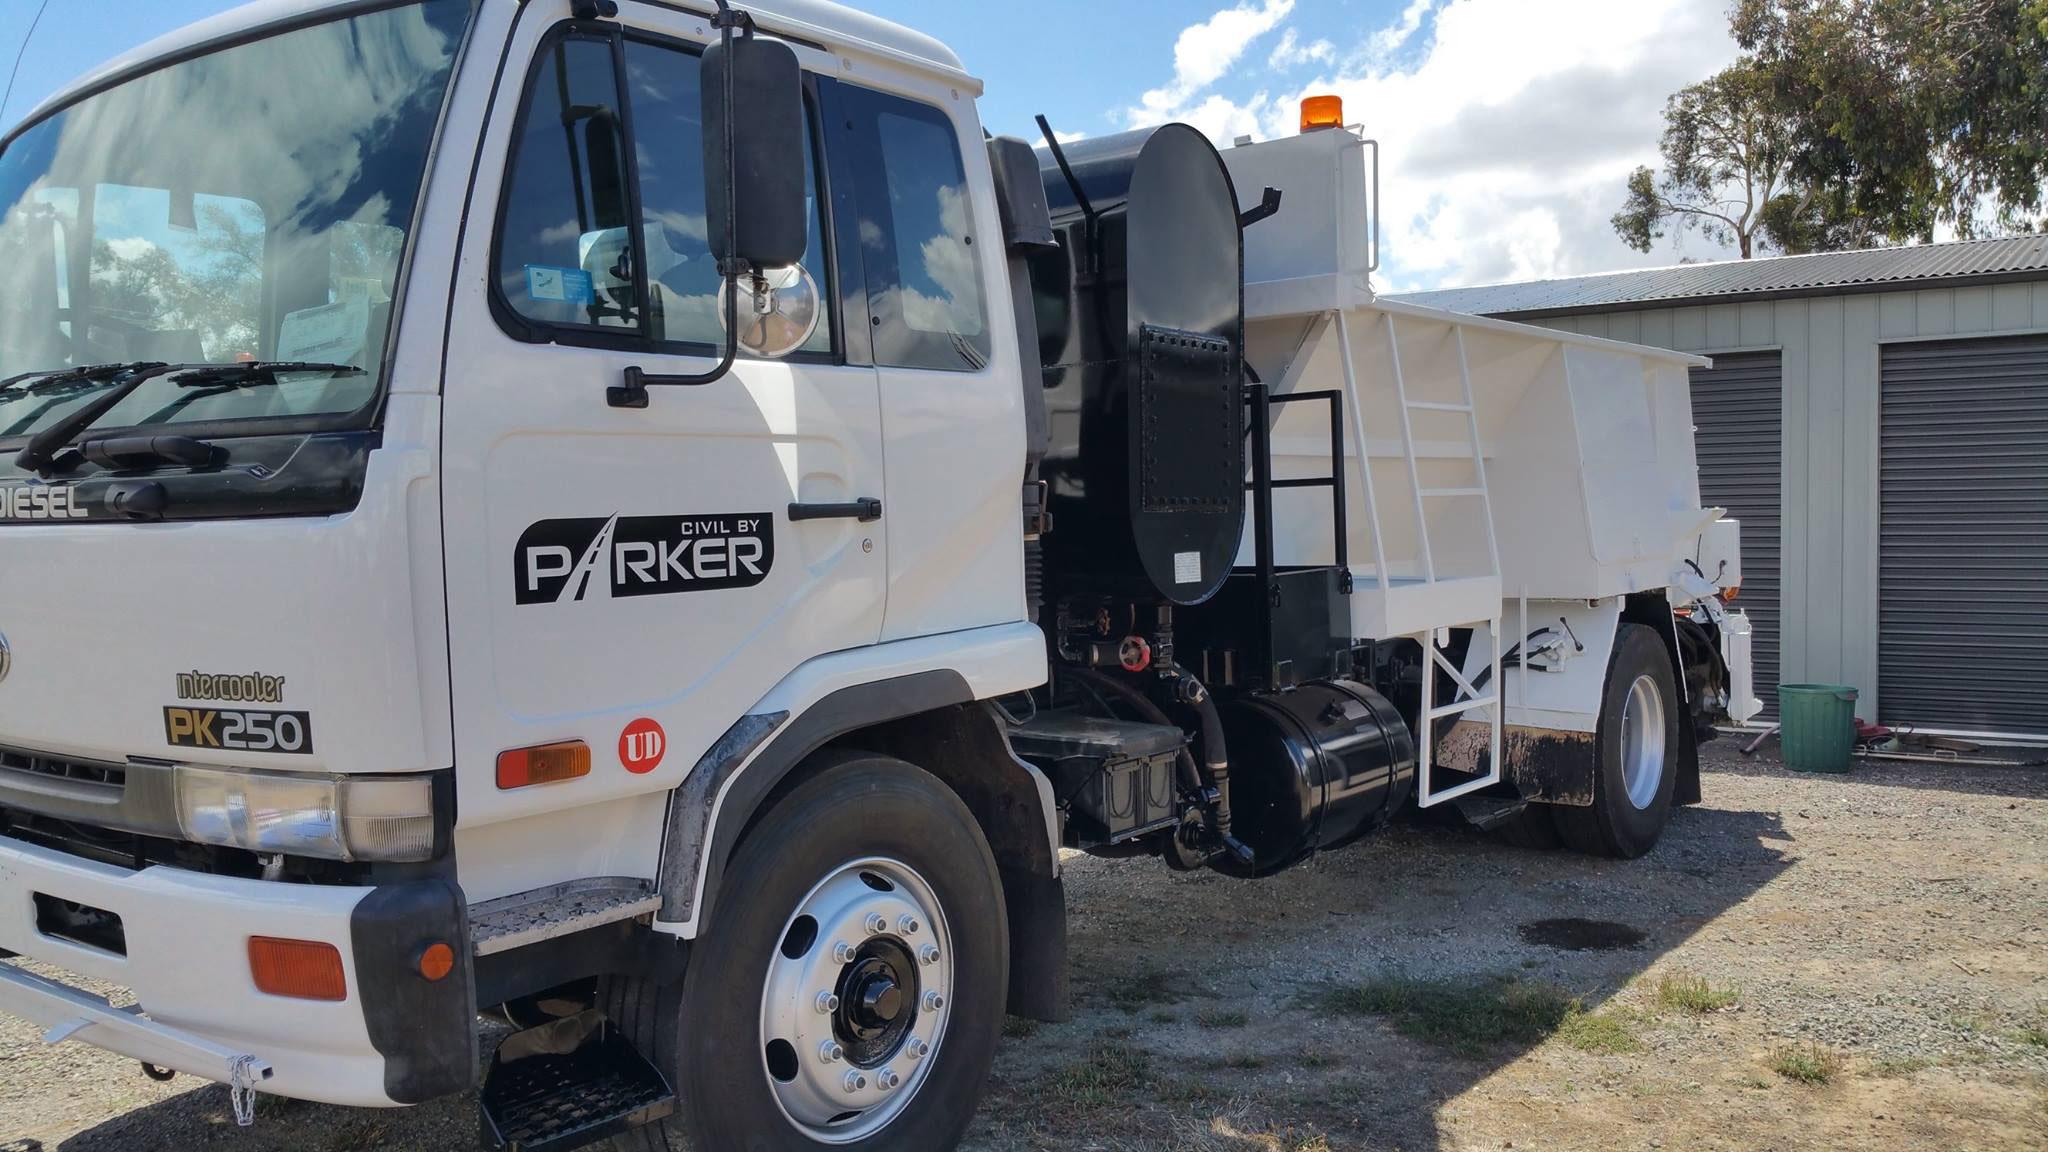 Civil by Parker - Ballarat - Belly Dumper Truck Hire